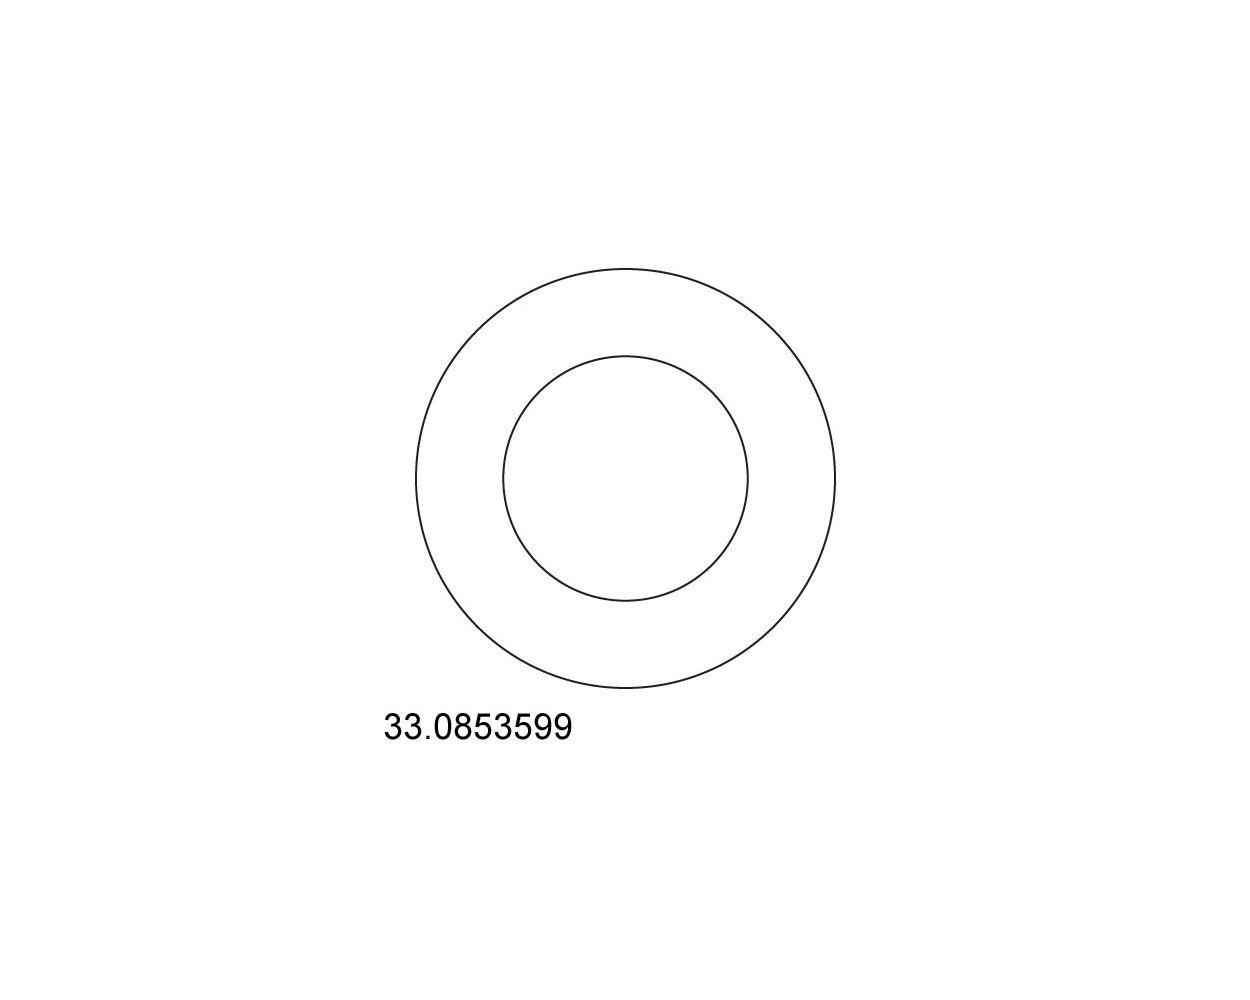 WASHER - M6 12MM OD X 6MM ID X